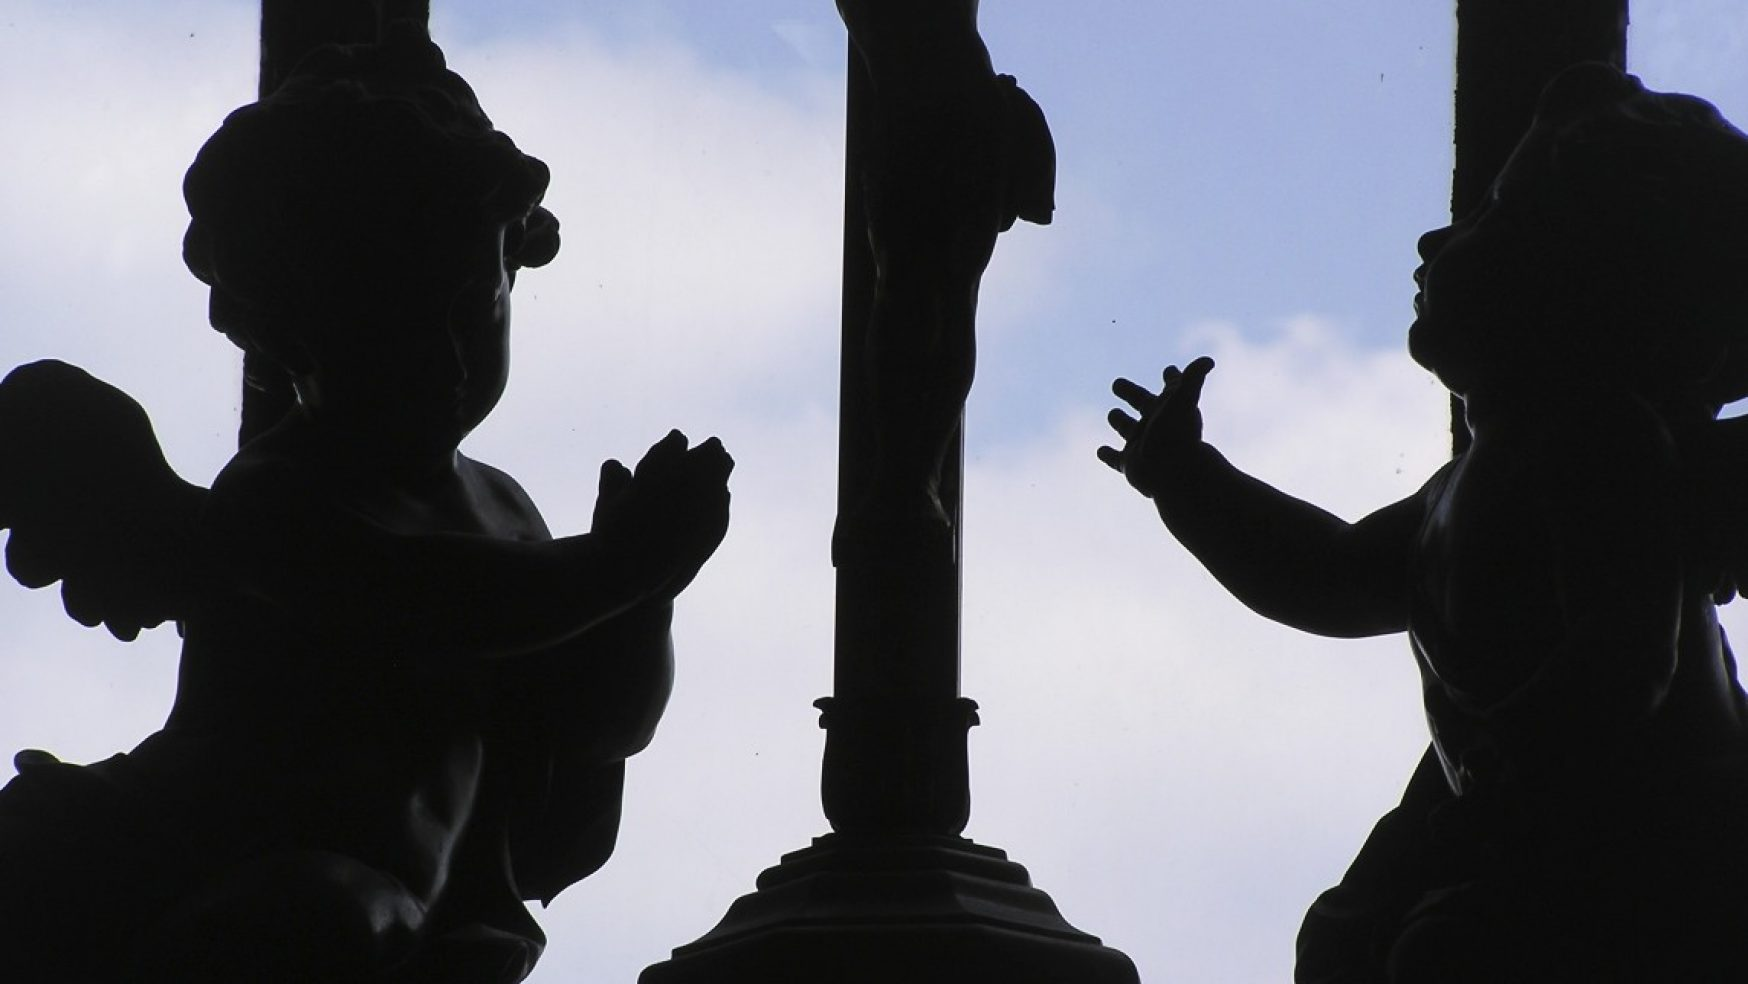 Four Assumptive Worlds of Psychopathy II: The World of Spiritual Aberrations